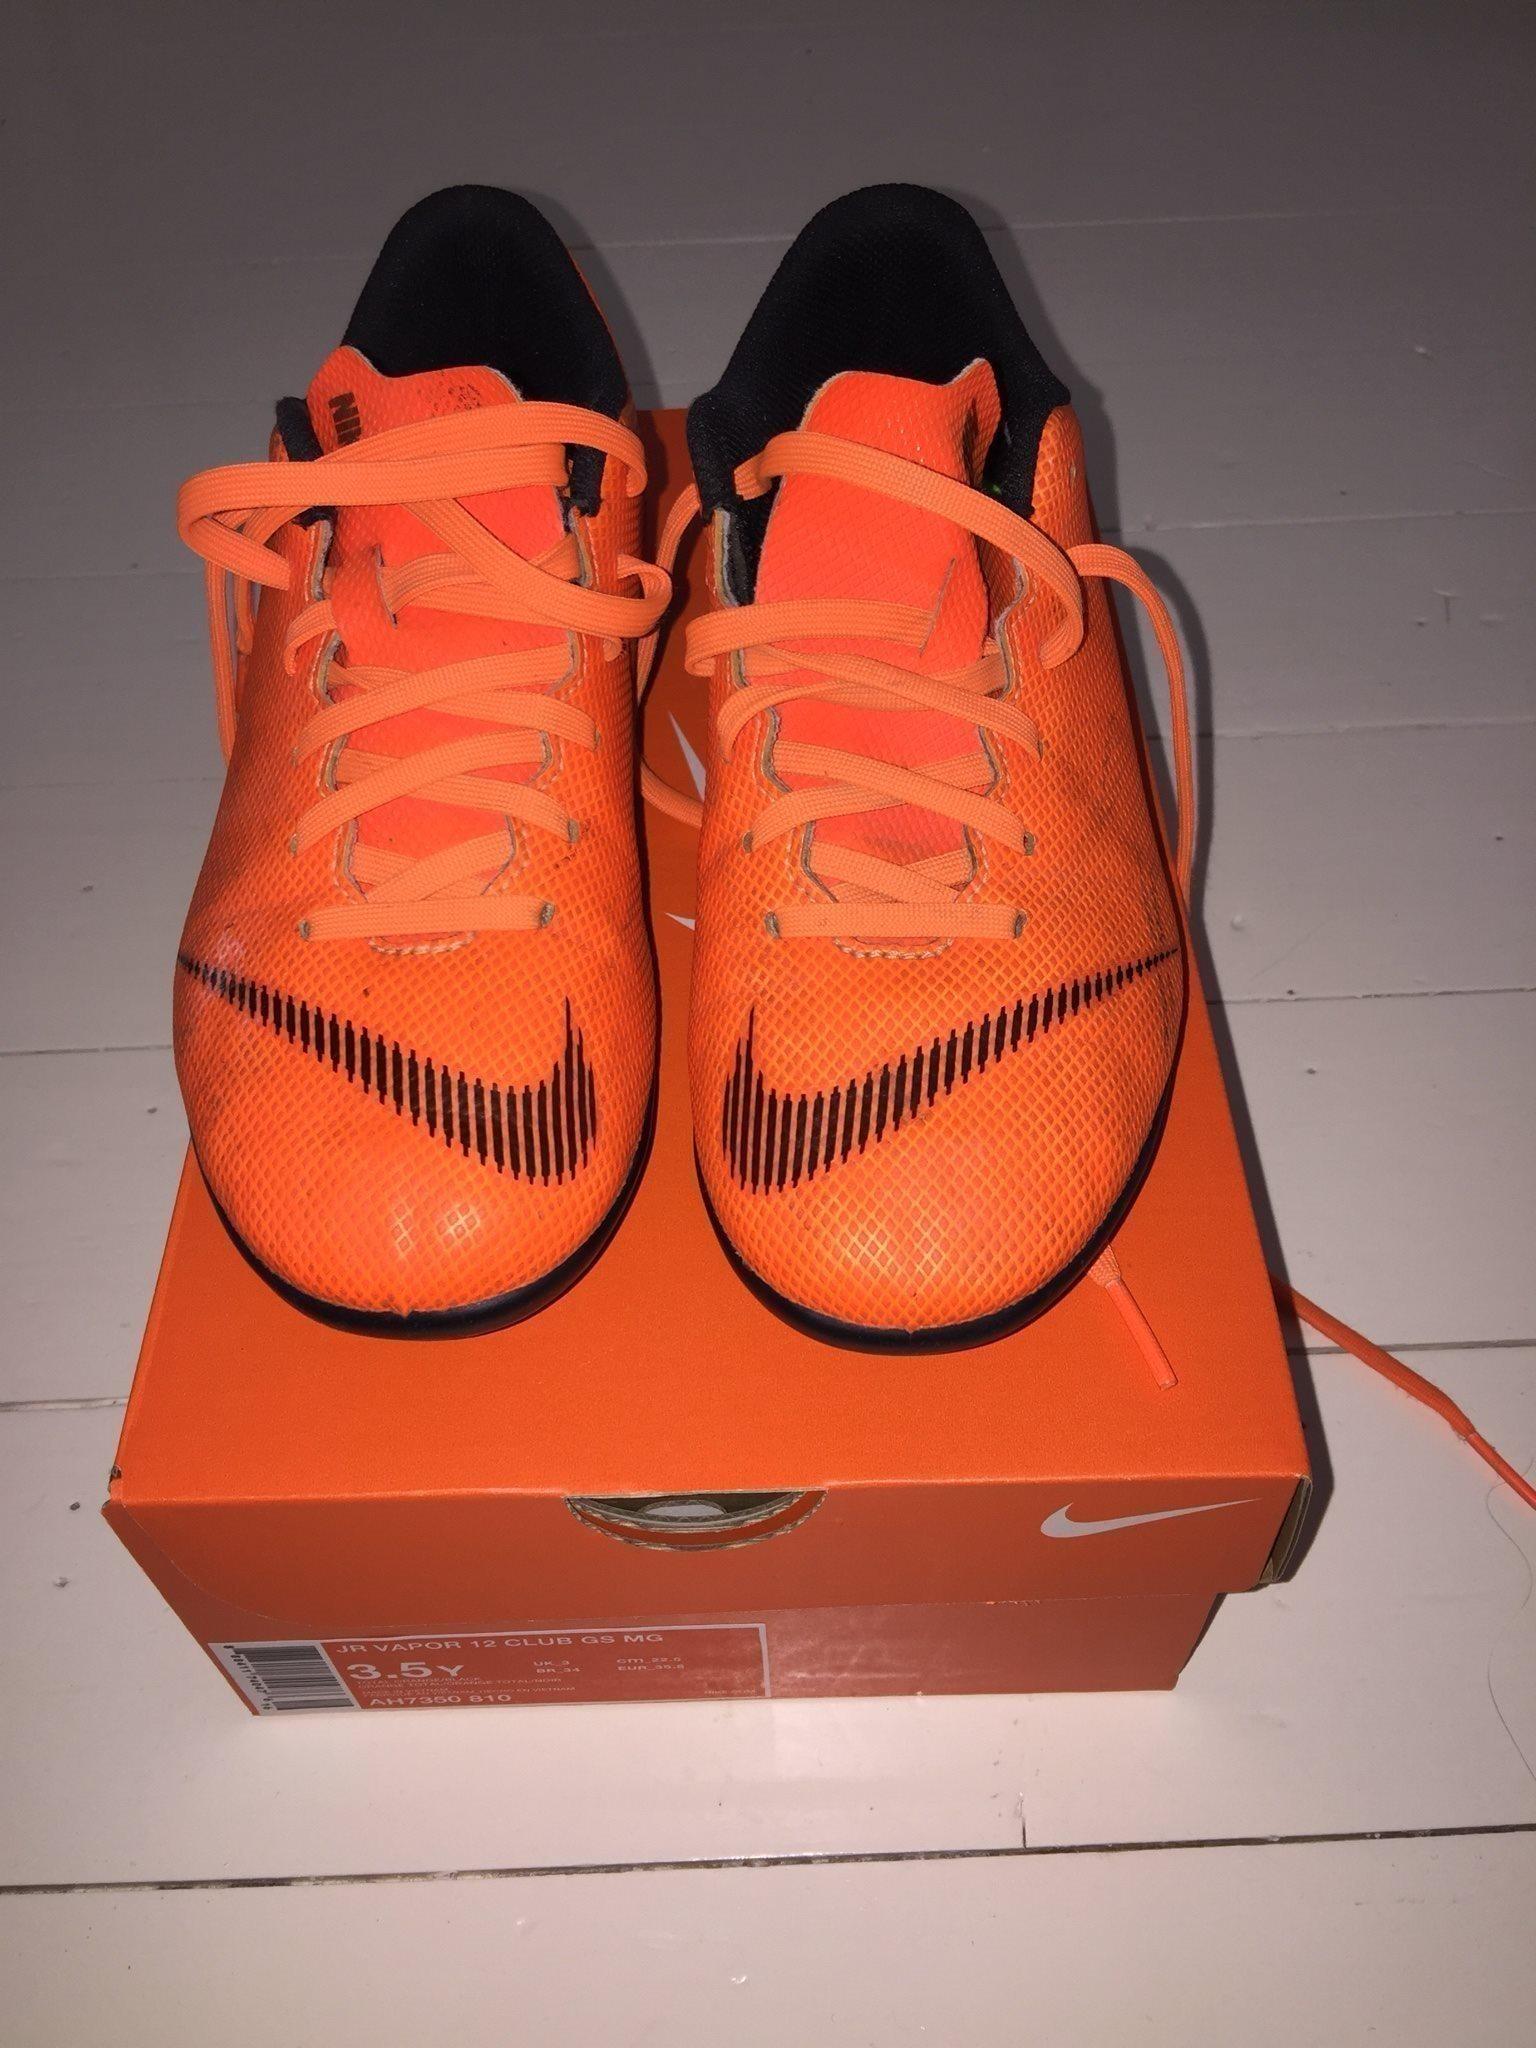 half off 340e4 af70d Nike Fotbollsskor Fotboll Skor Storlek 35,5 Fin.. (341910575) ᐈ Köp på  Tradera